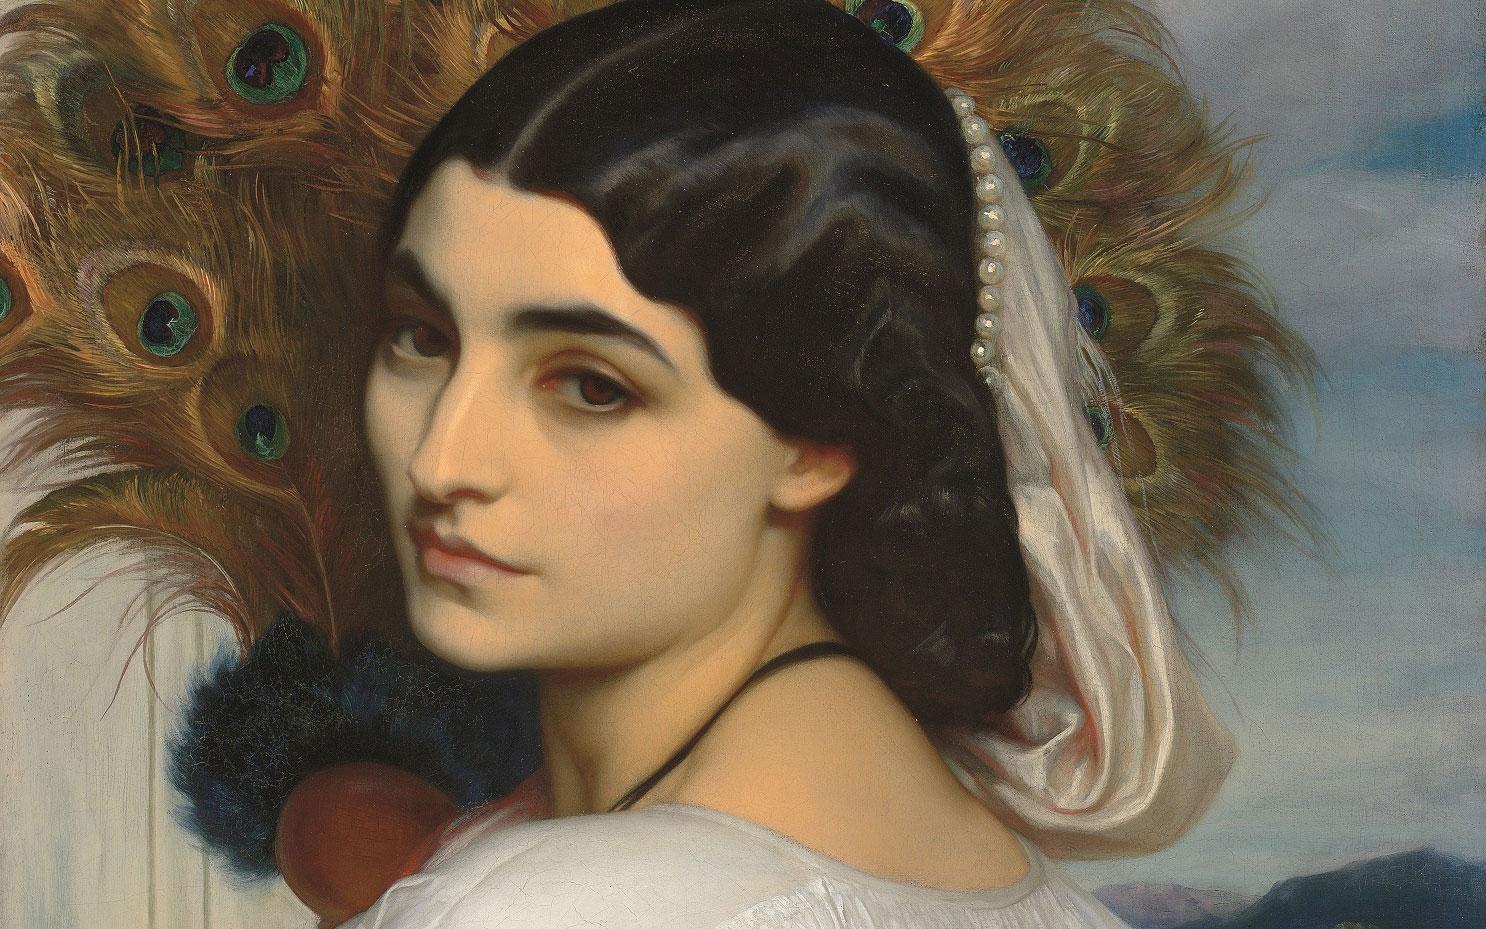 100 years of English beauty de